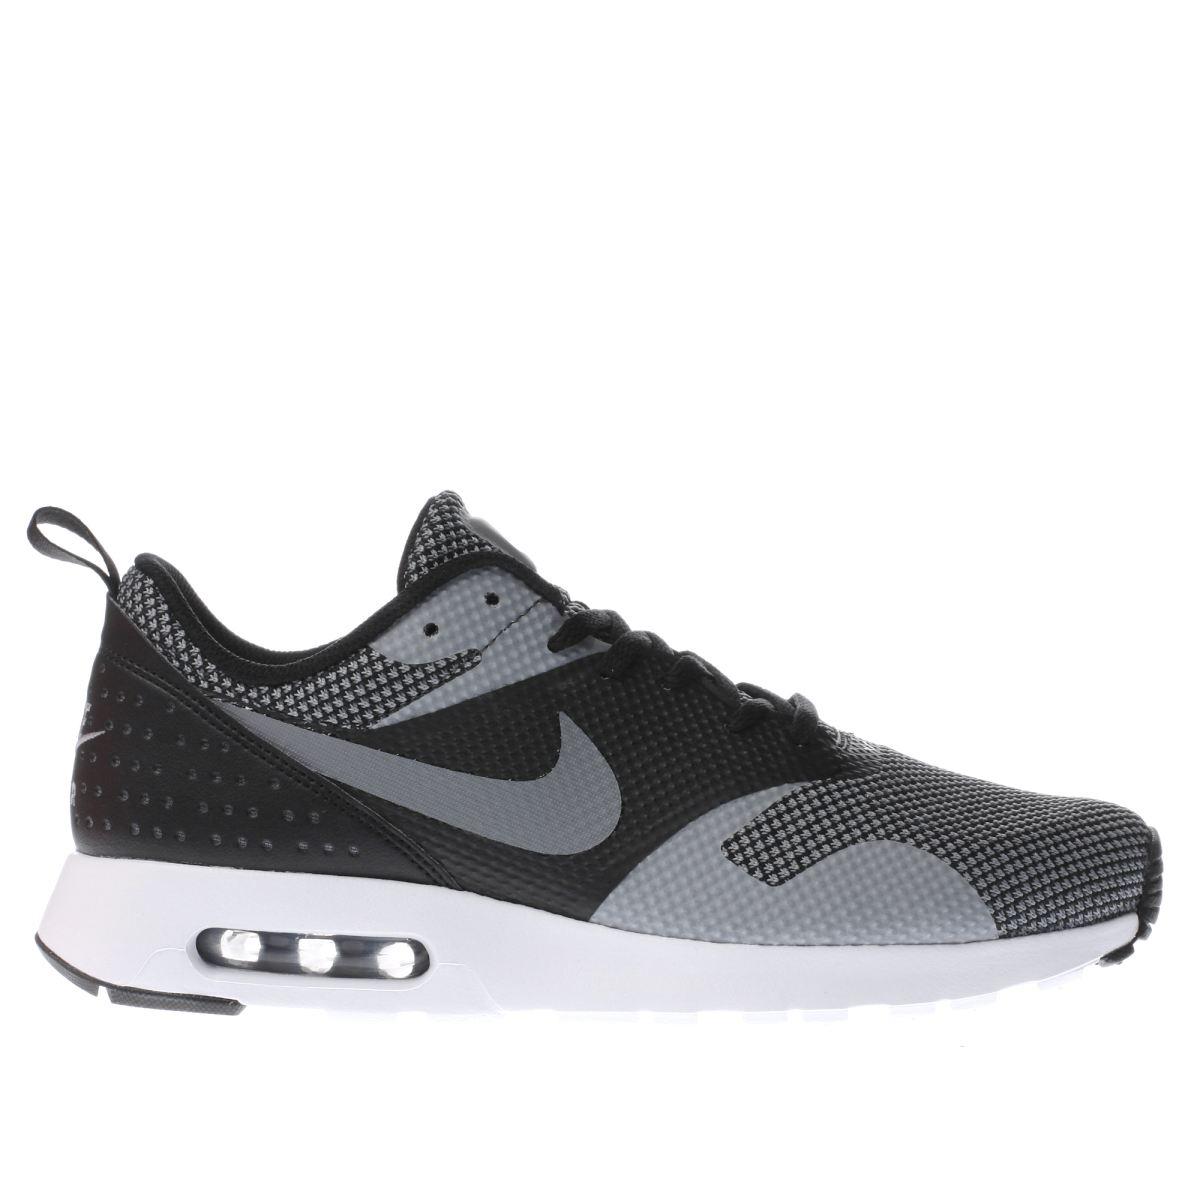 nike black & grey air max tavas premium trainers